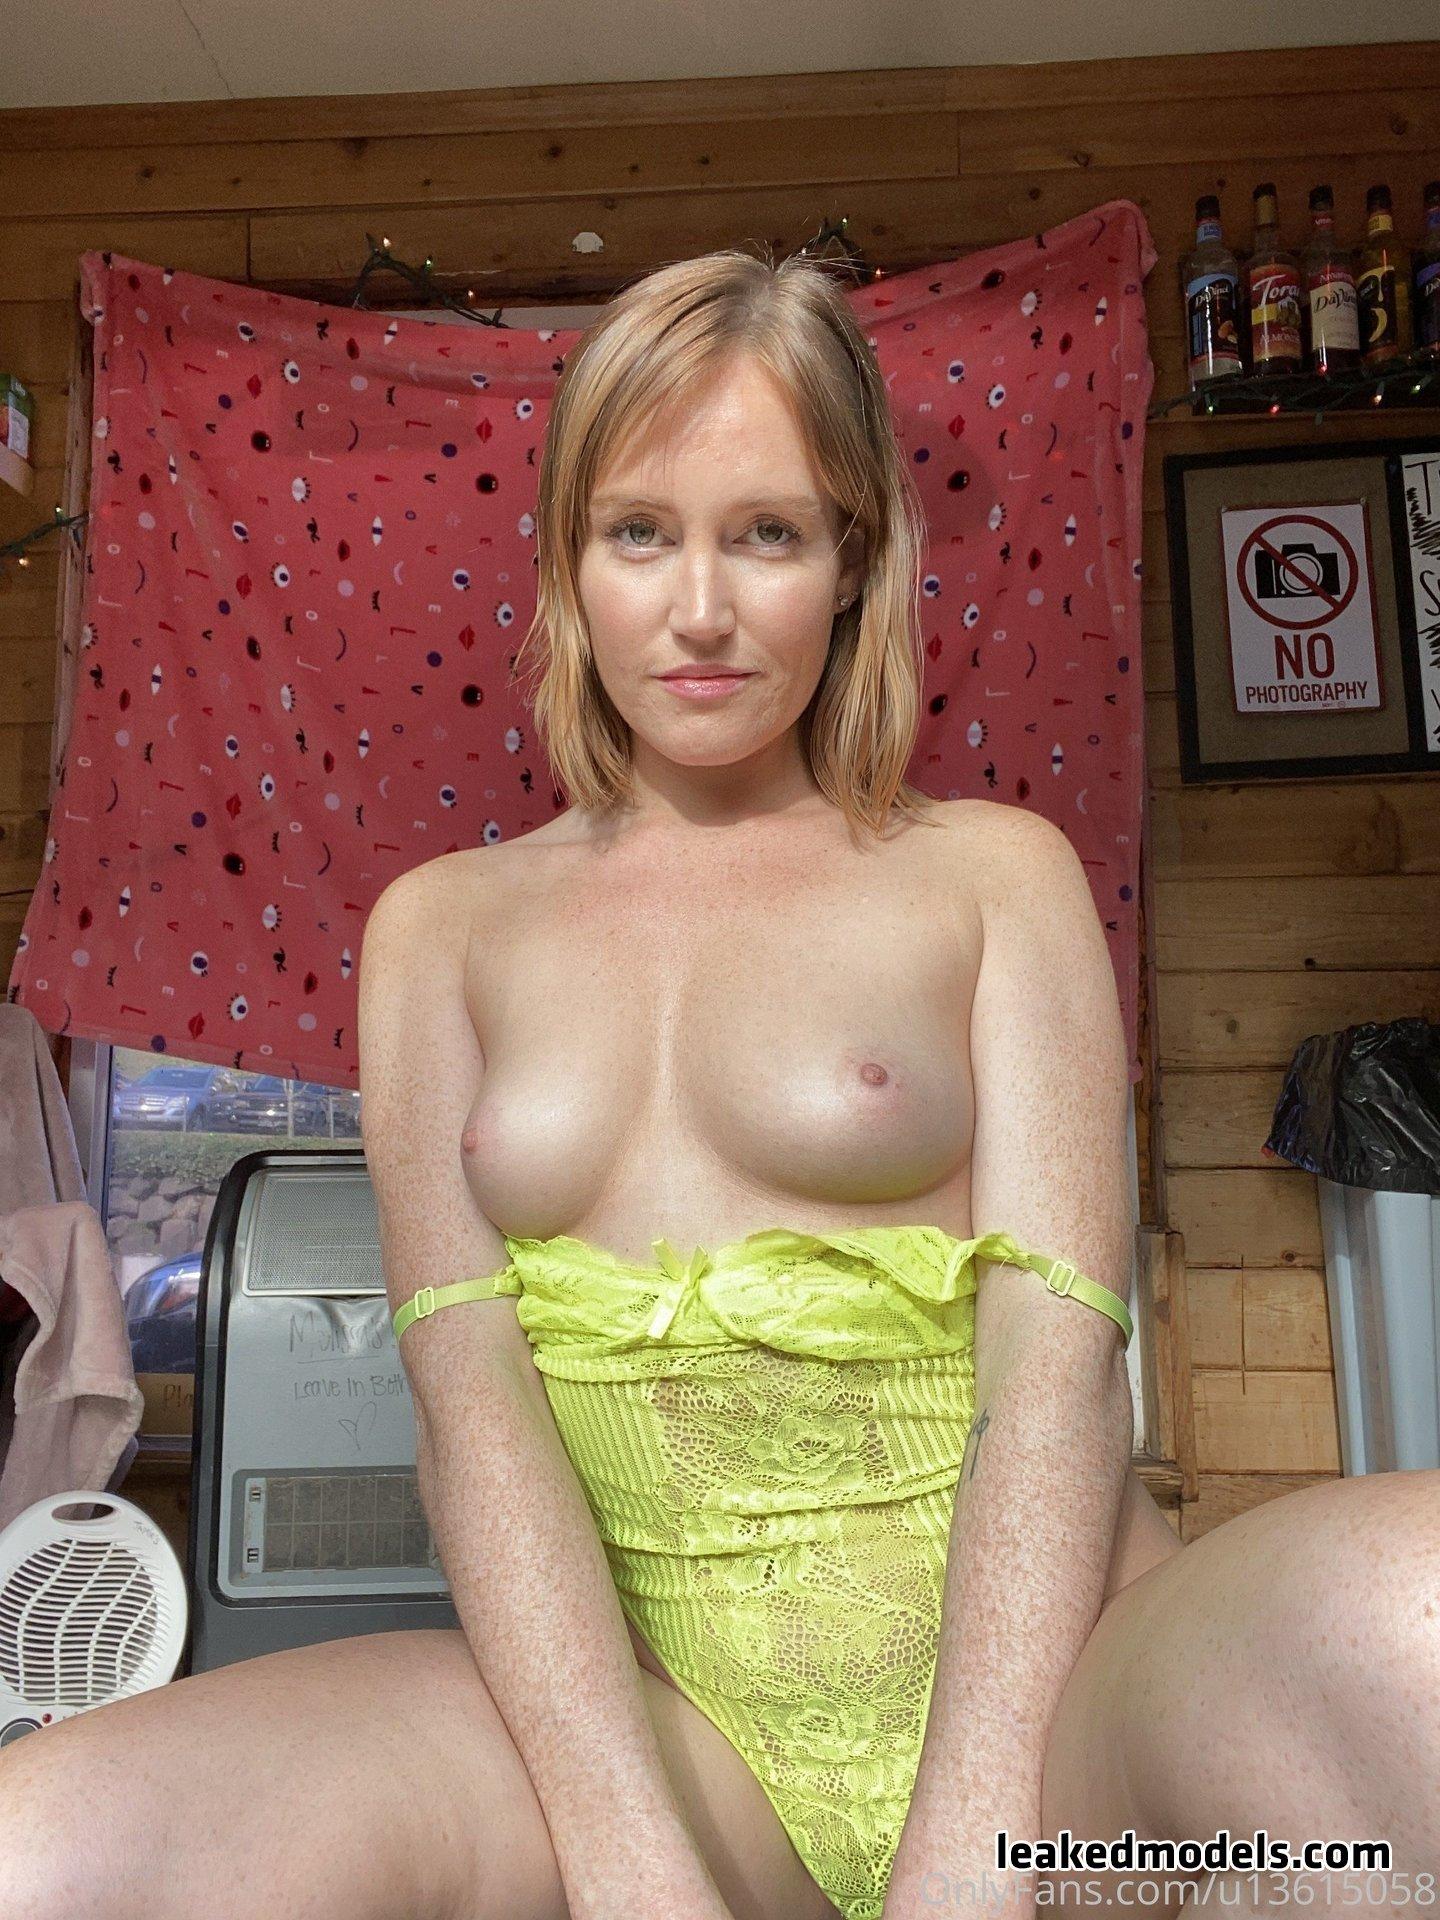 Bikini barista – bikinibarista_audrey OnlyFans Nude Leaks (25 Photos)